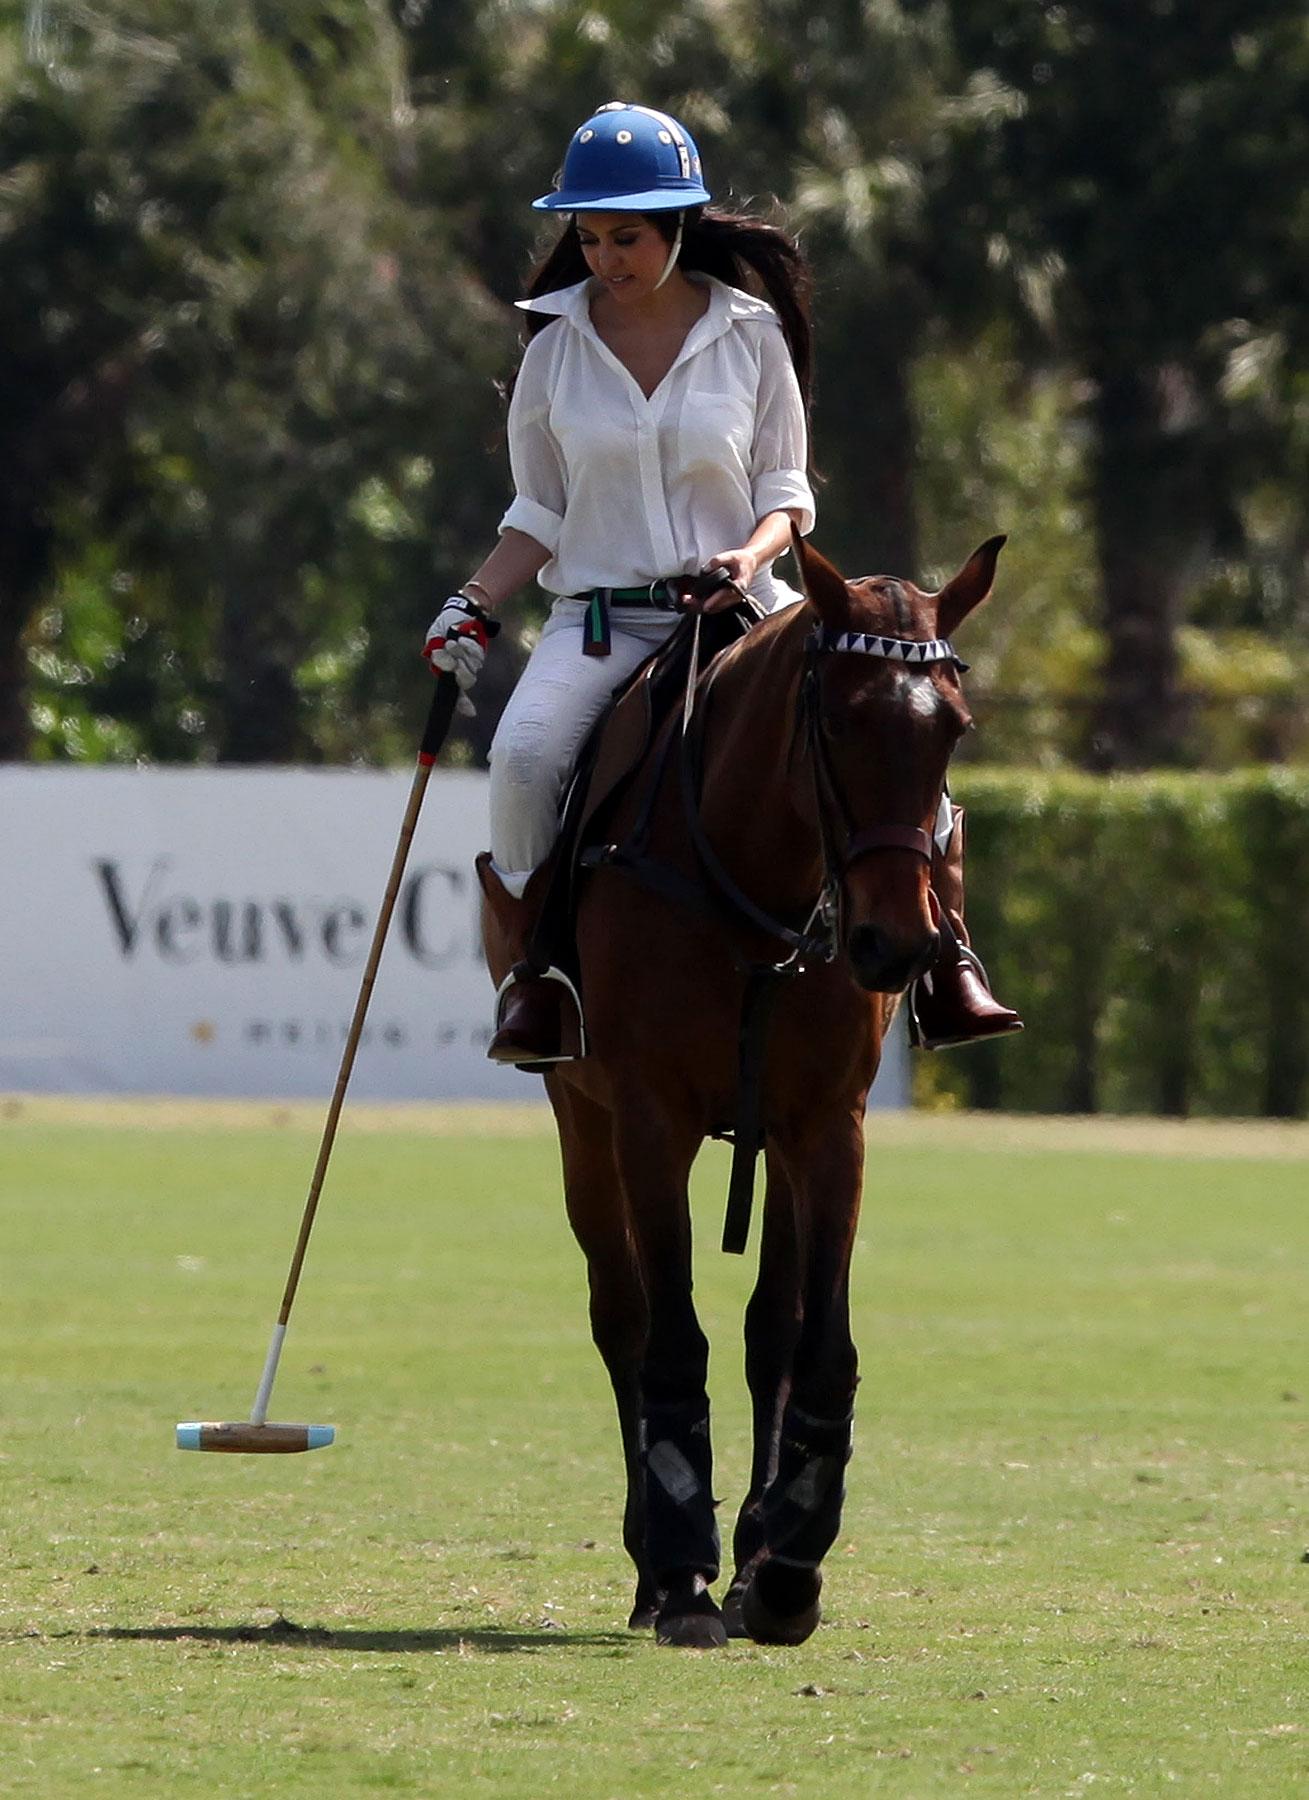 The Kardashians Klass Up A Polo Match (PHOTOS)